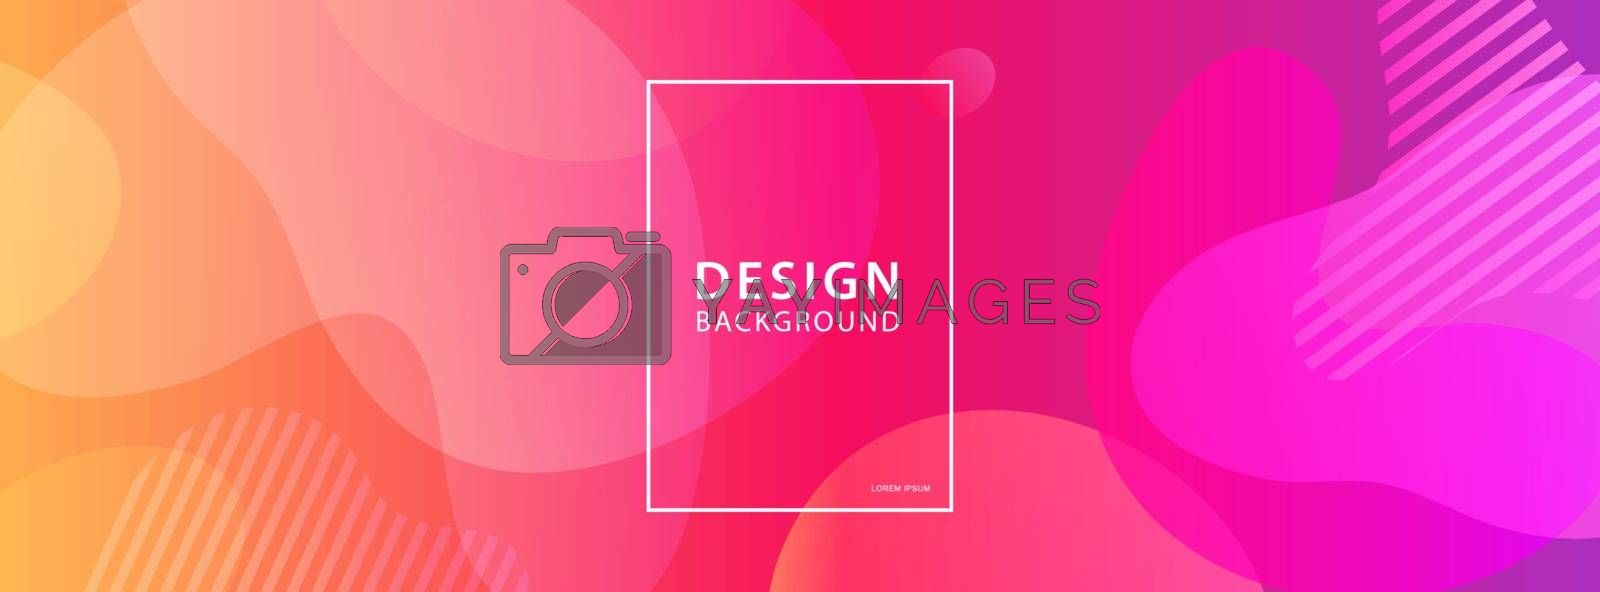 Fluid shape banner design background. Liquid geometric gradient template.